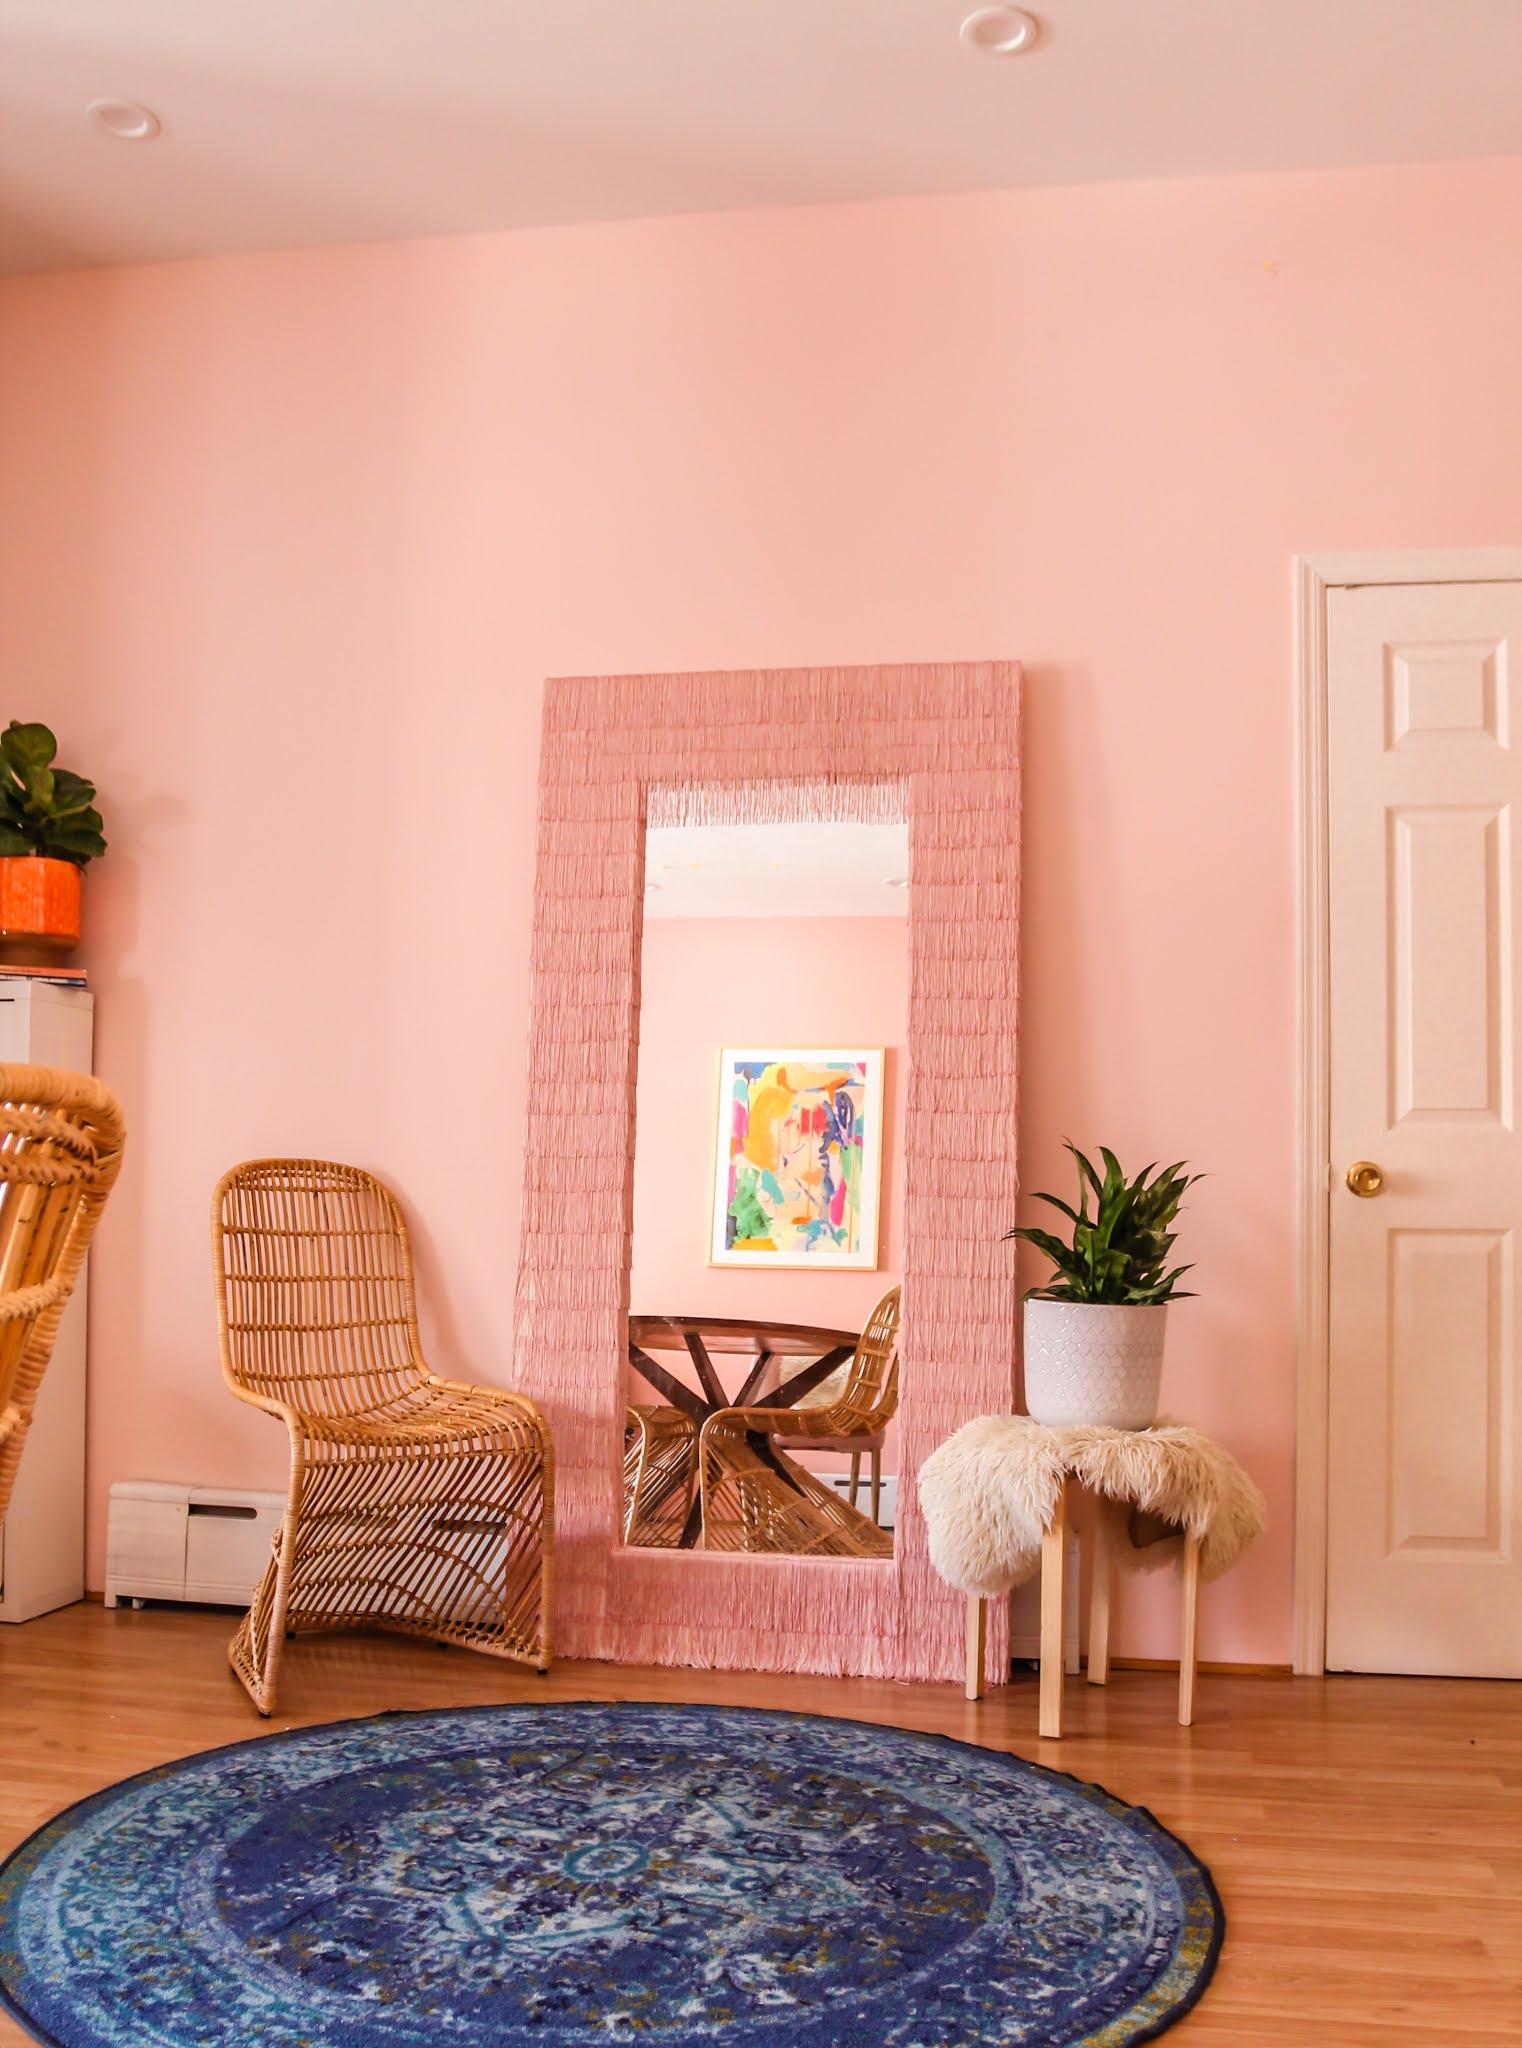 Ikea Hack // Ikea Mirror Hacks // Fringe Mirror // DIY fringe mirror // DIY floor length fringe mirror // floor length fringe mirror // pink fringe mirror // fringe diy // Megan Zietz // tfdiaries // easy ikea mirror epicycle // easy ikea mirror hack // easy ikea hacks // colorful homes // pink mirror // diy pink mirror // fringe mirror tutorial // budget friendly mirror diy // ikea mongstad mirror diy // ikea mongstad mirror hack // ikea mongstad